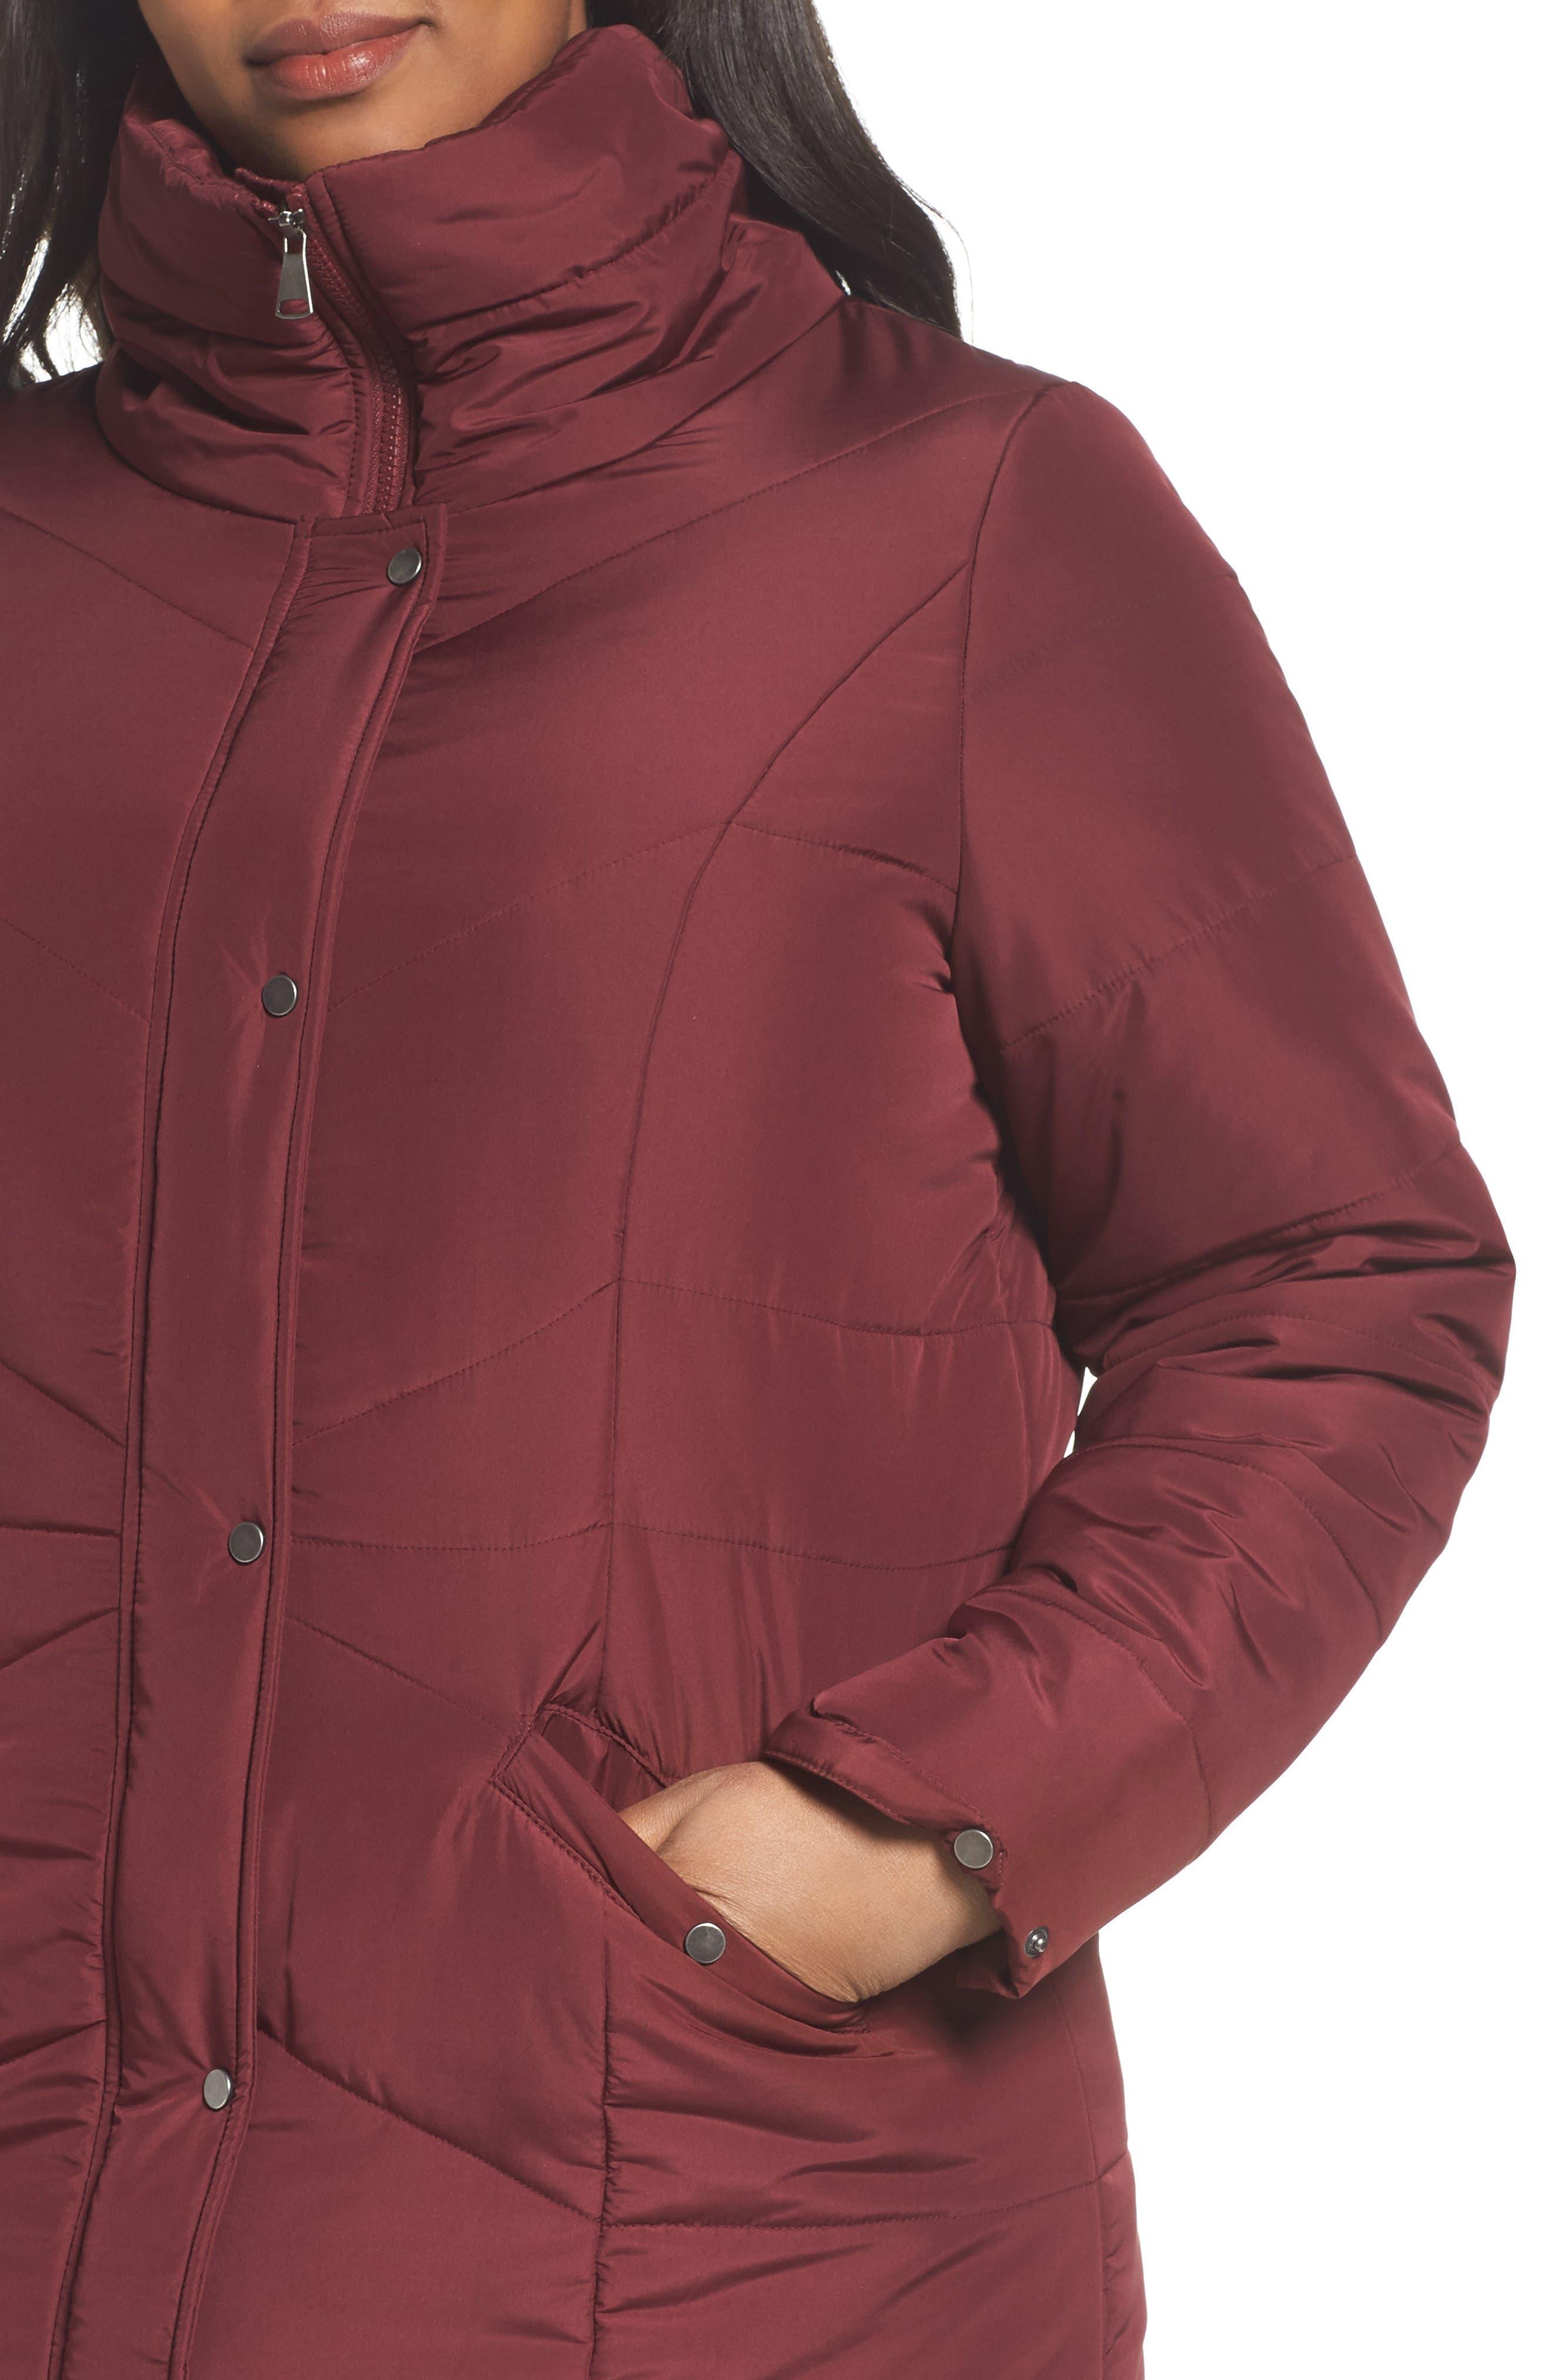 Valsi Puffer Jacket,                             Alternate thumbnail 4, color,